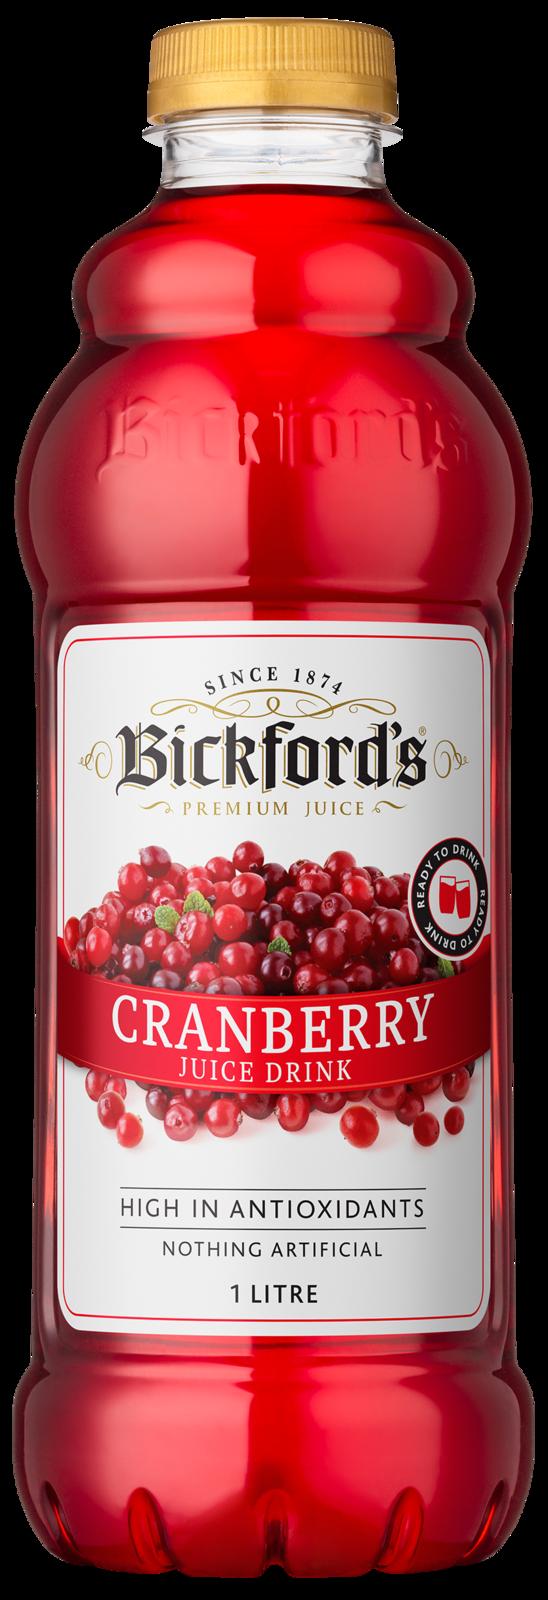 Bickfords: Premium Juice - Cranberry 1L 6pk image